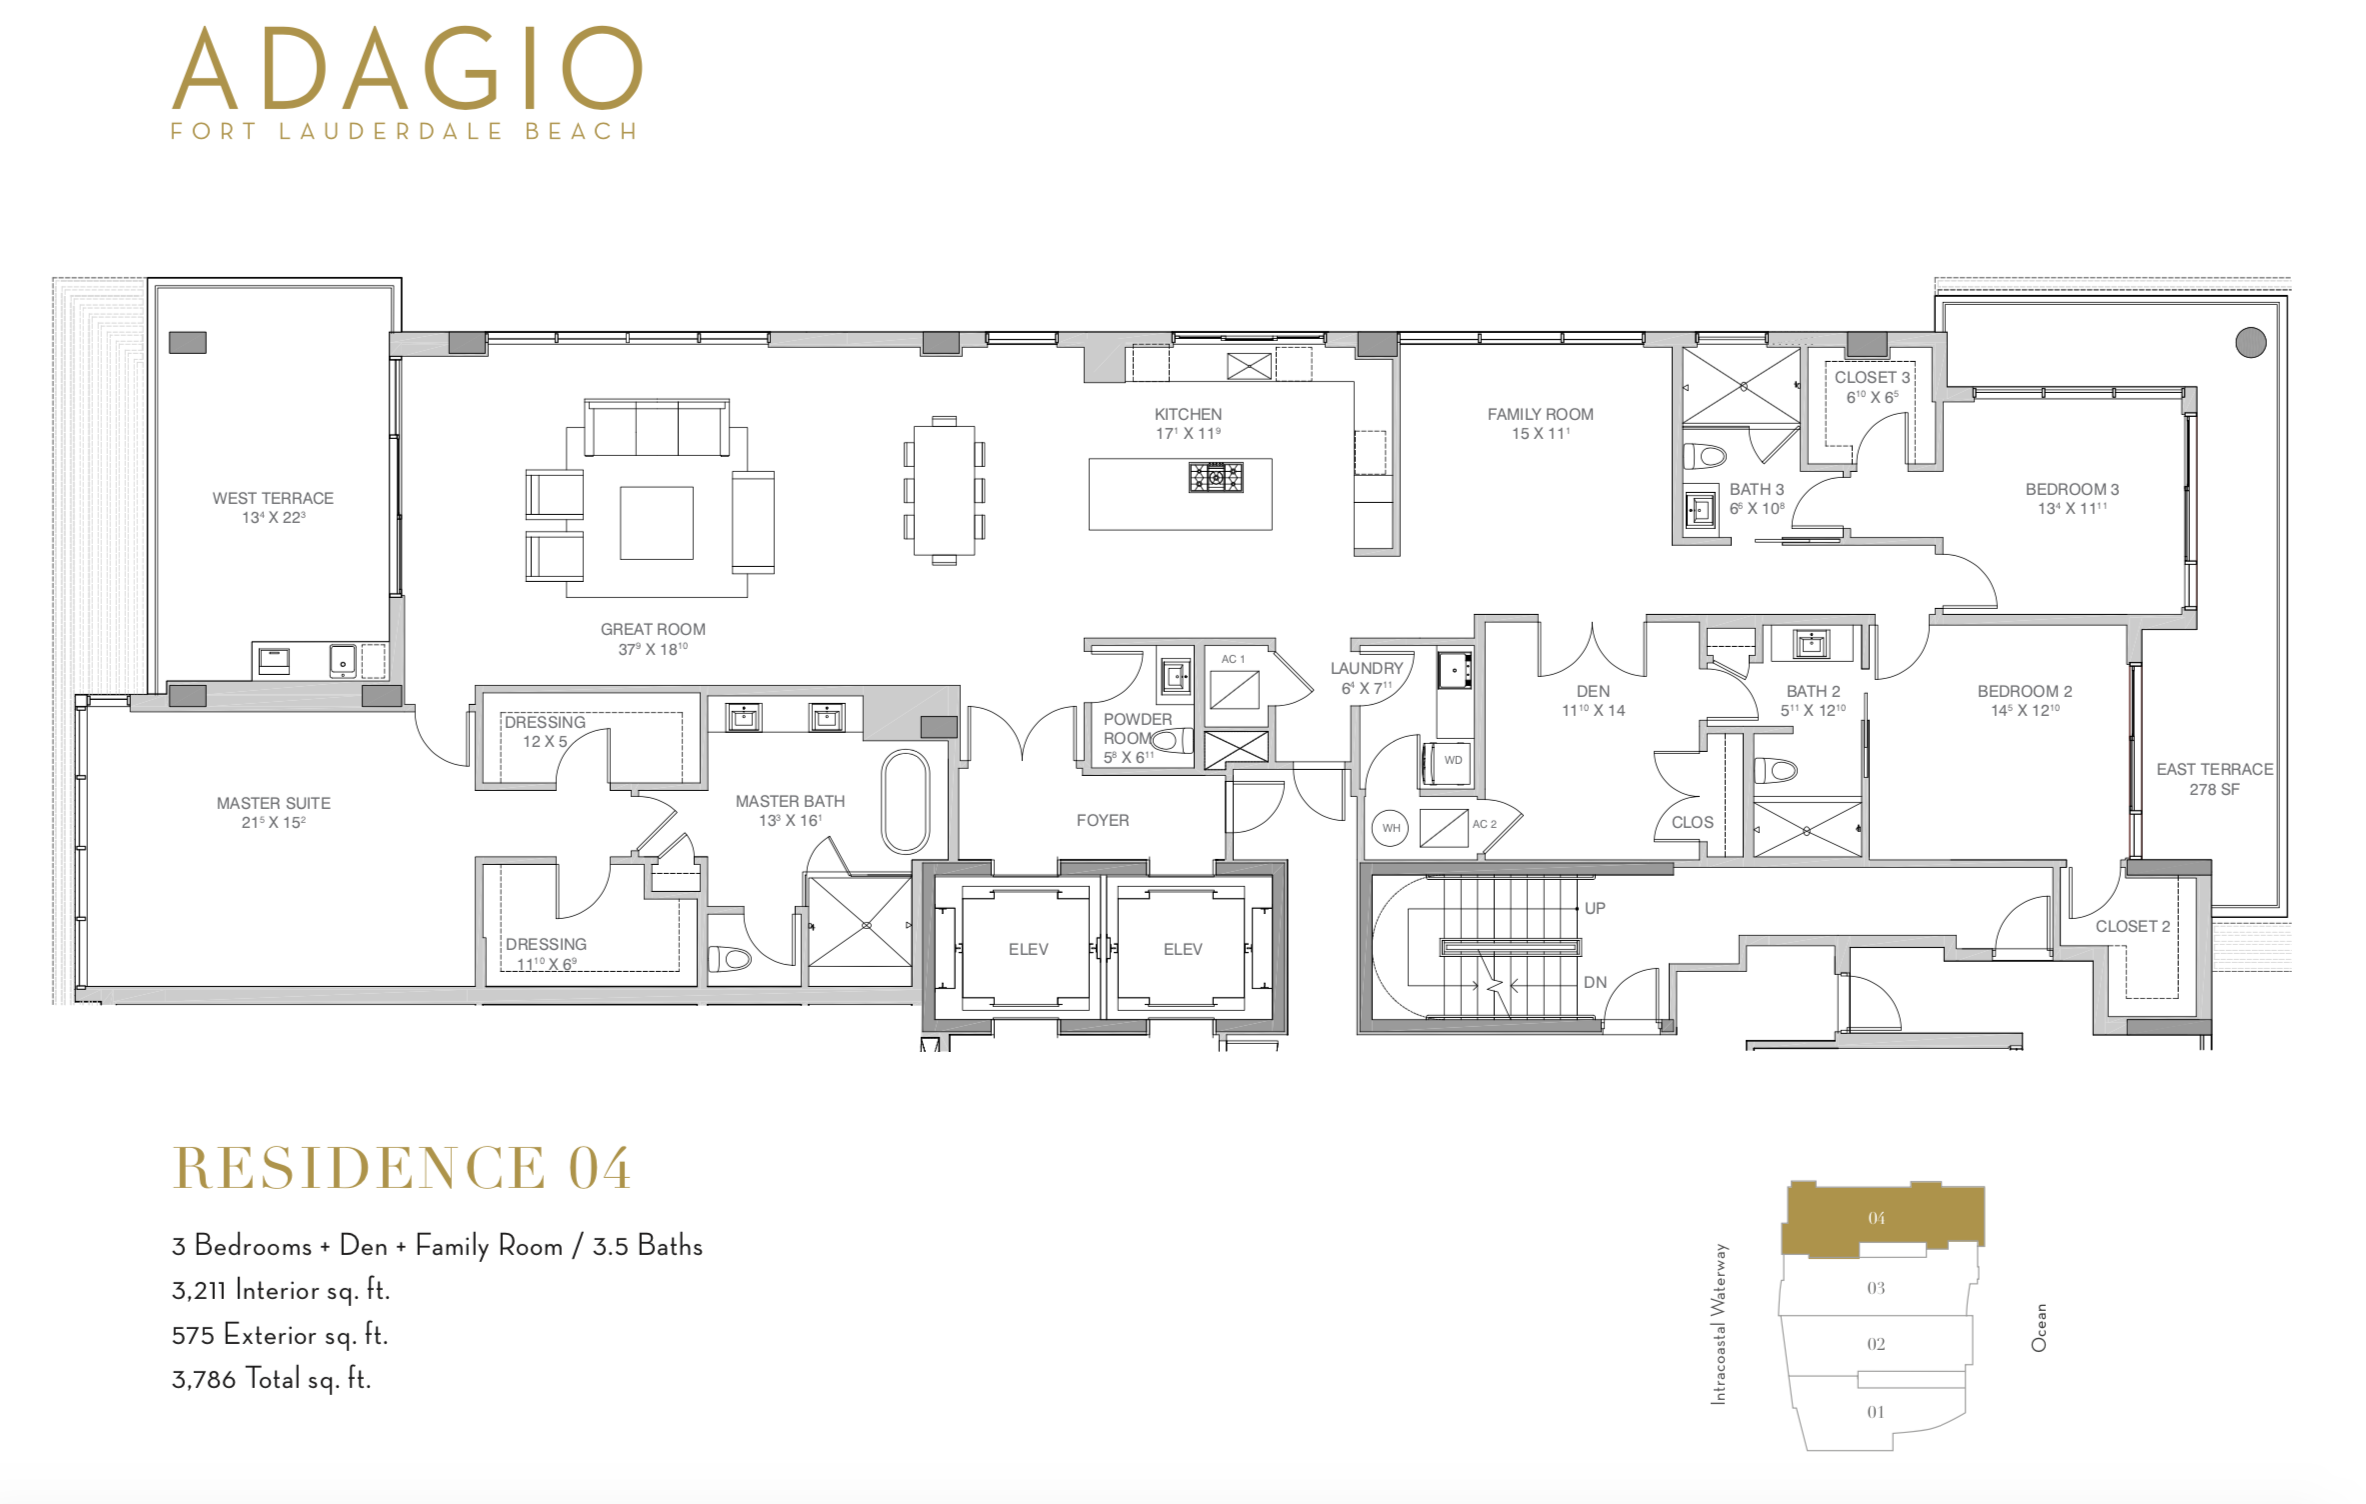 Adagio Fort Lauderdale | Residence 04Adagio Fort Lauderdale | Residence 04